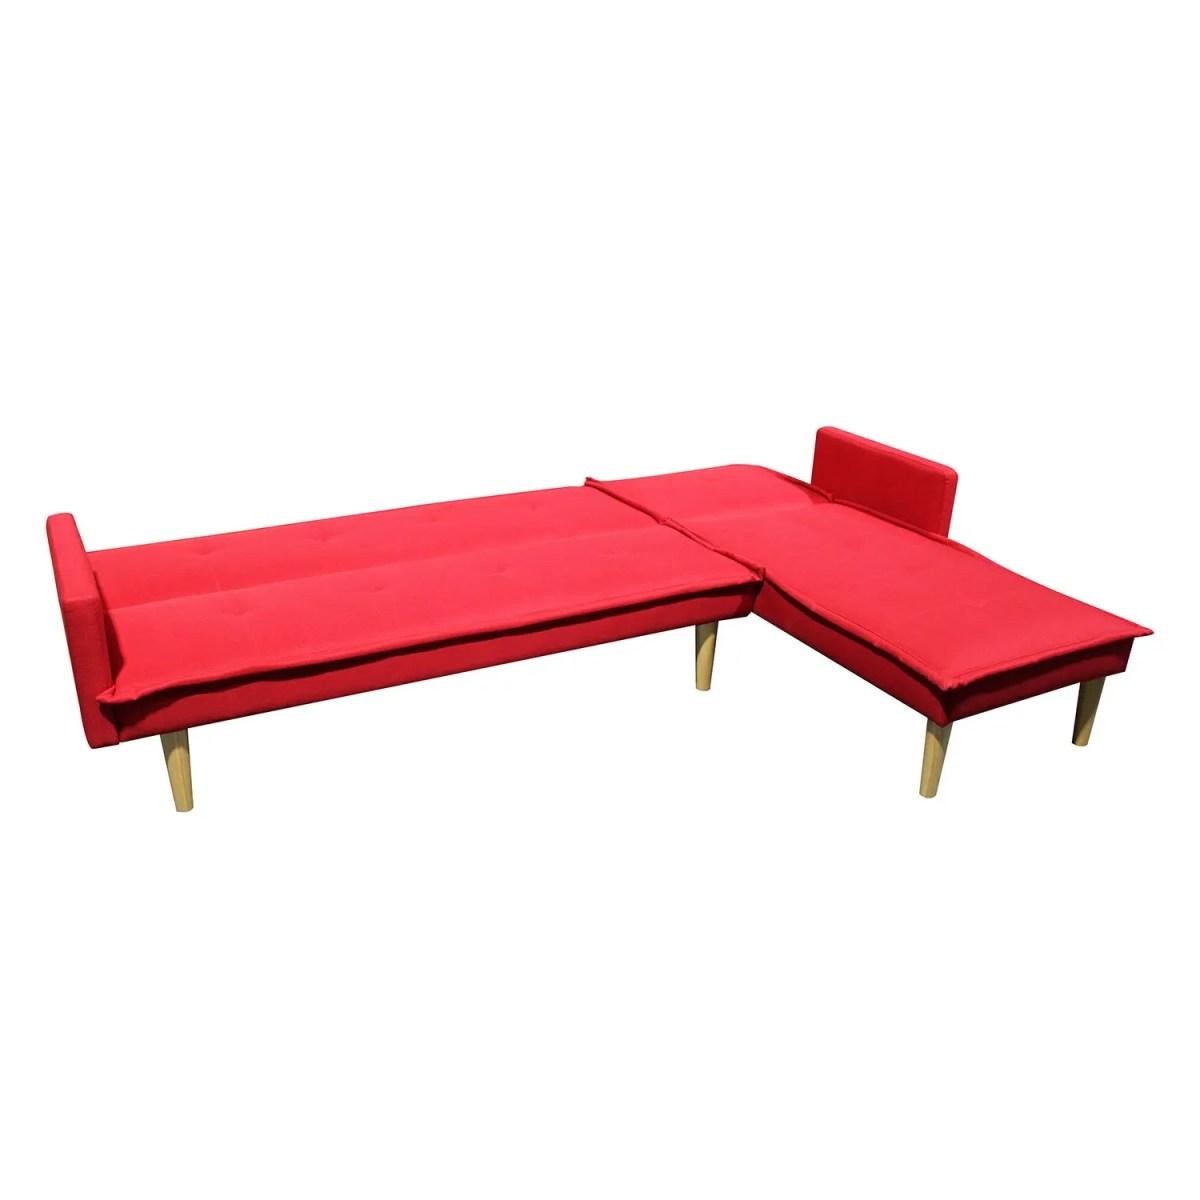 sala esquinada sofá cama independencia rojo 6